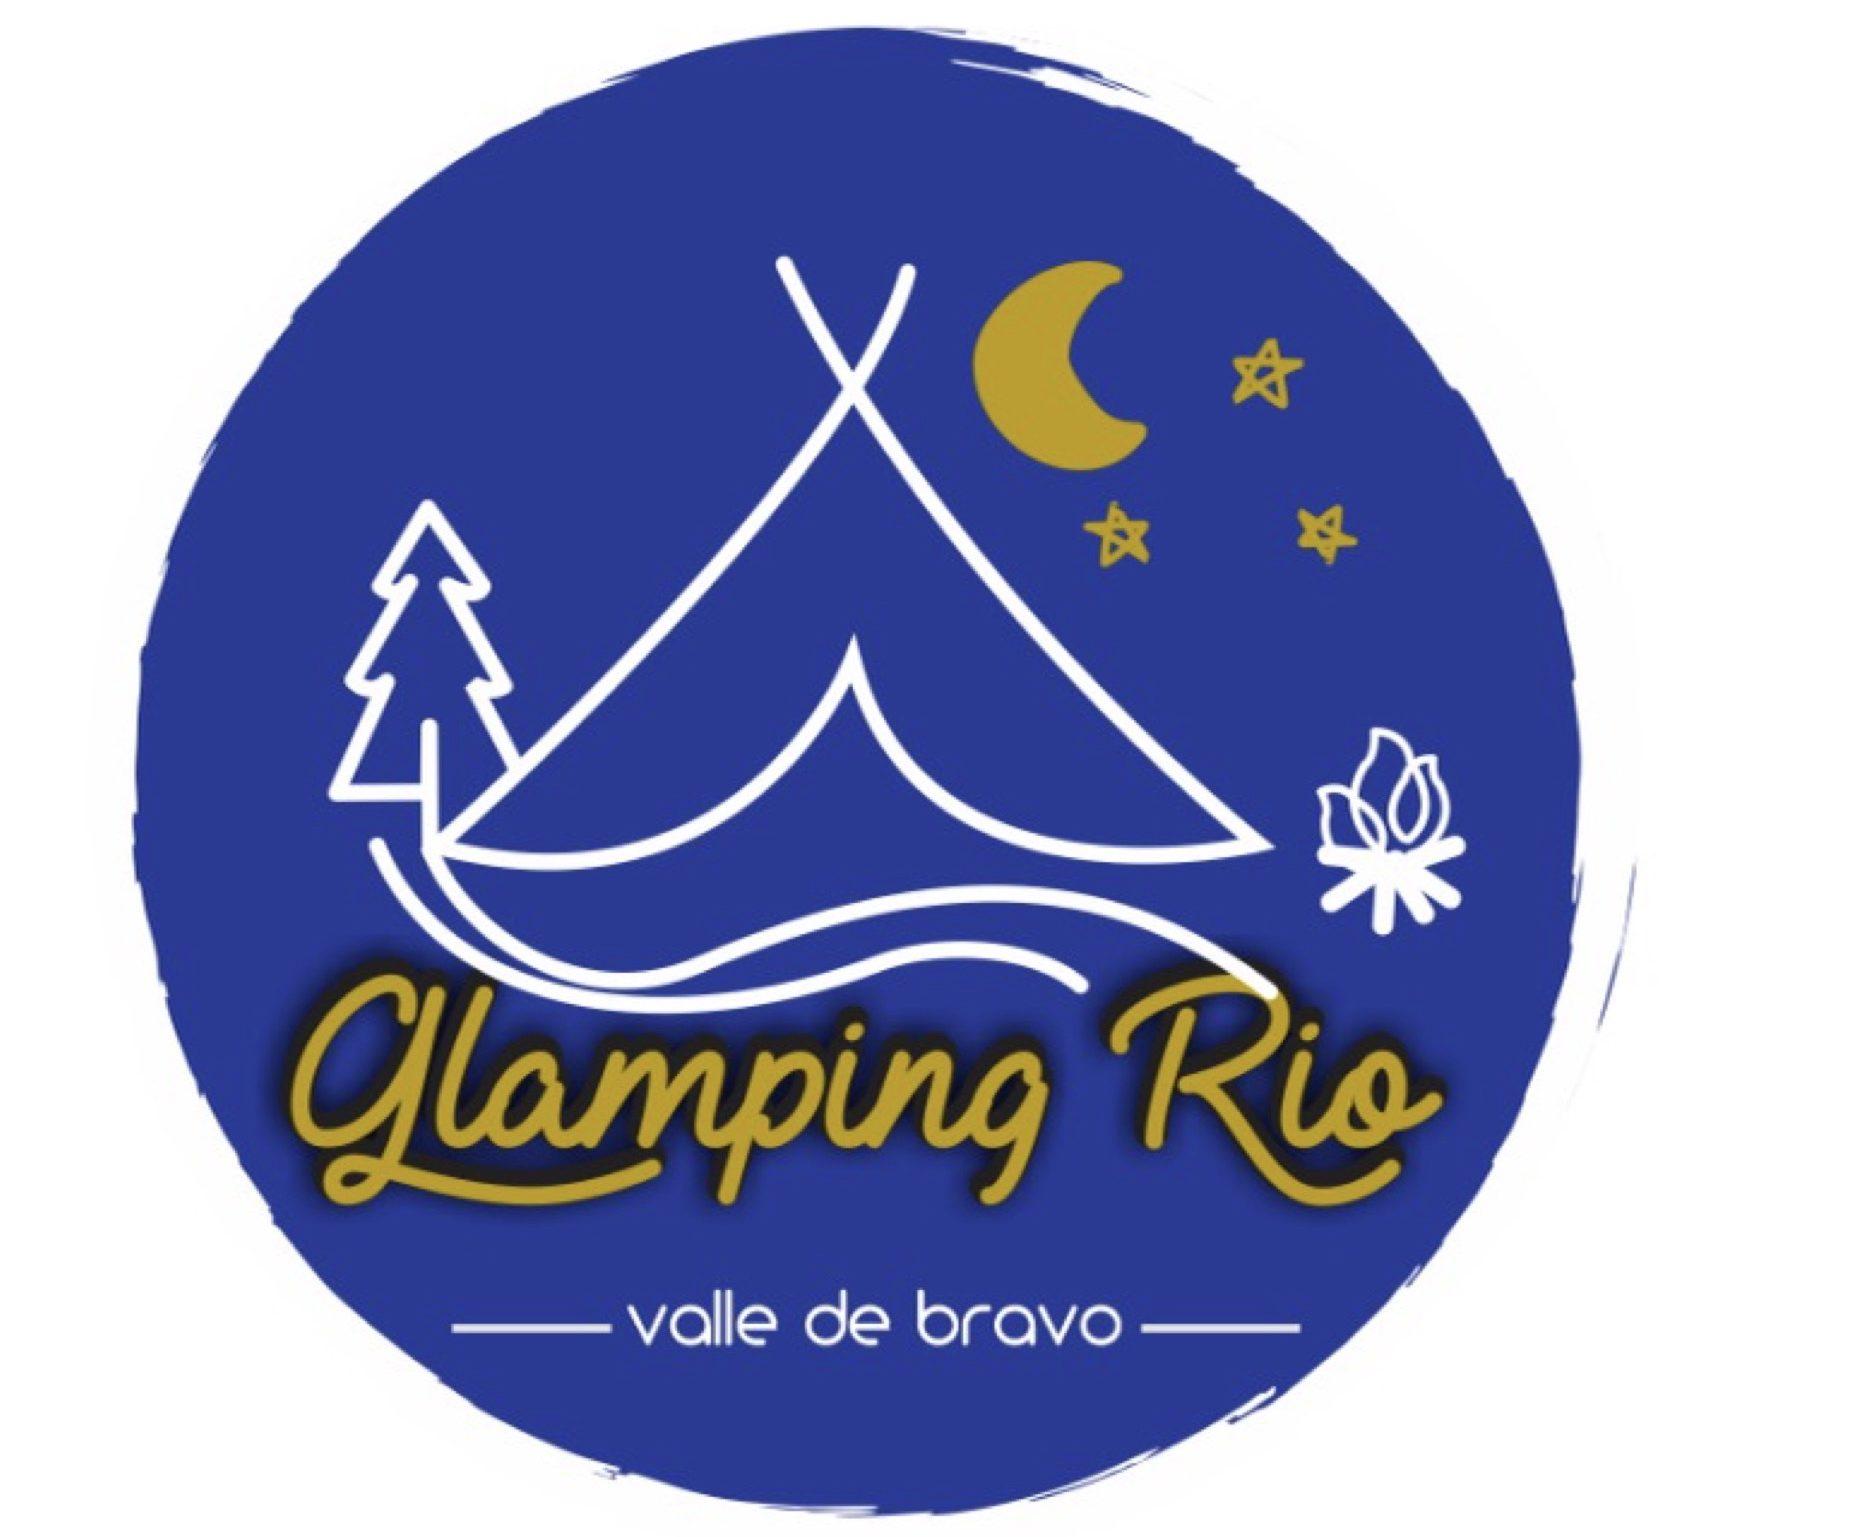 Glamping Rio Valle de Bravo